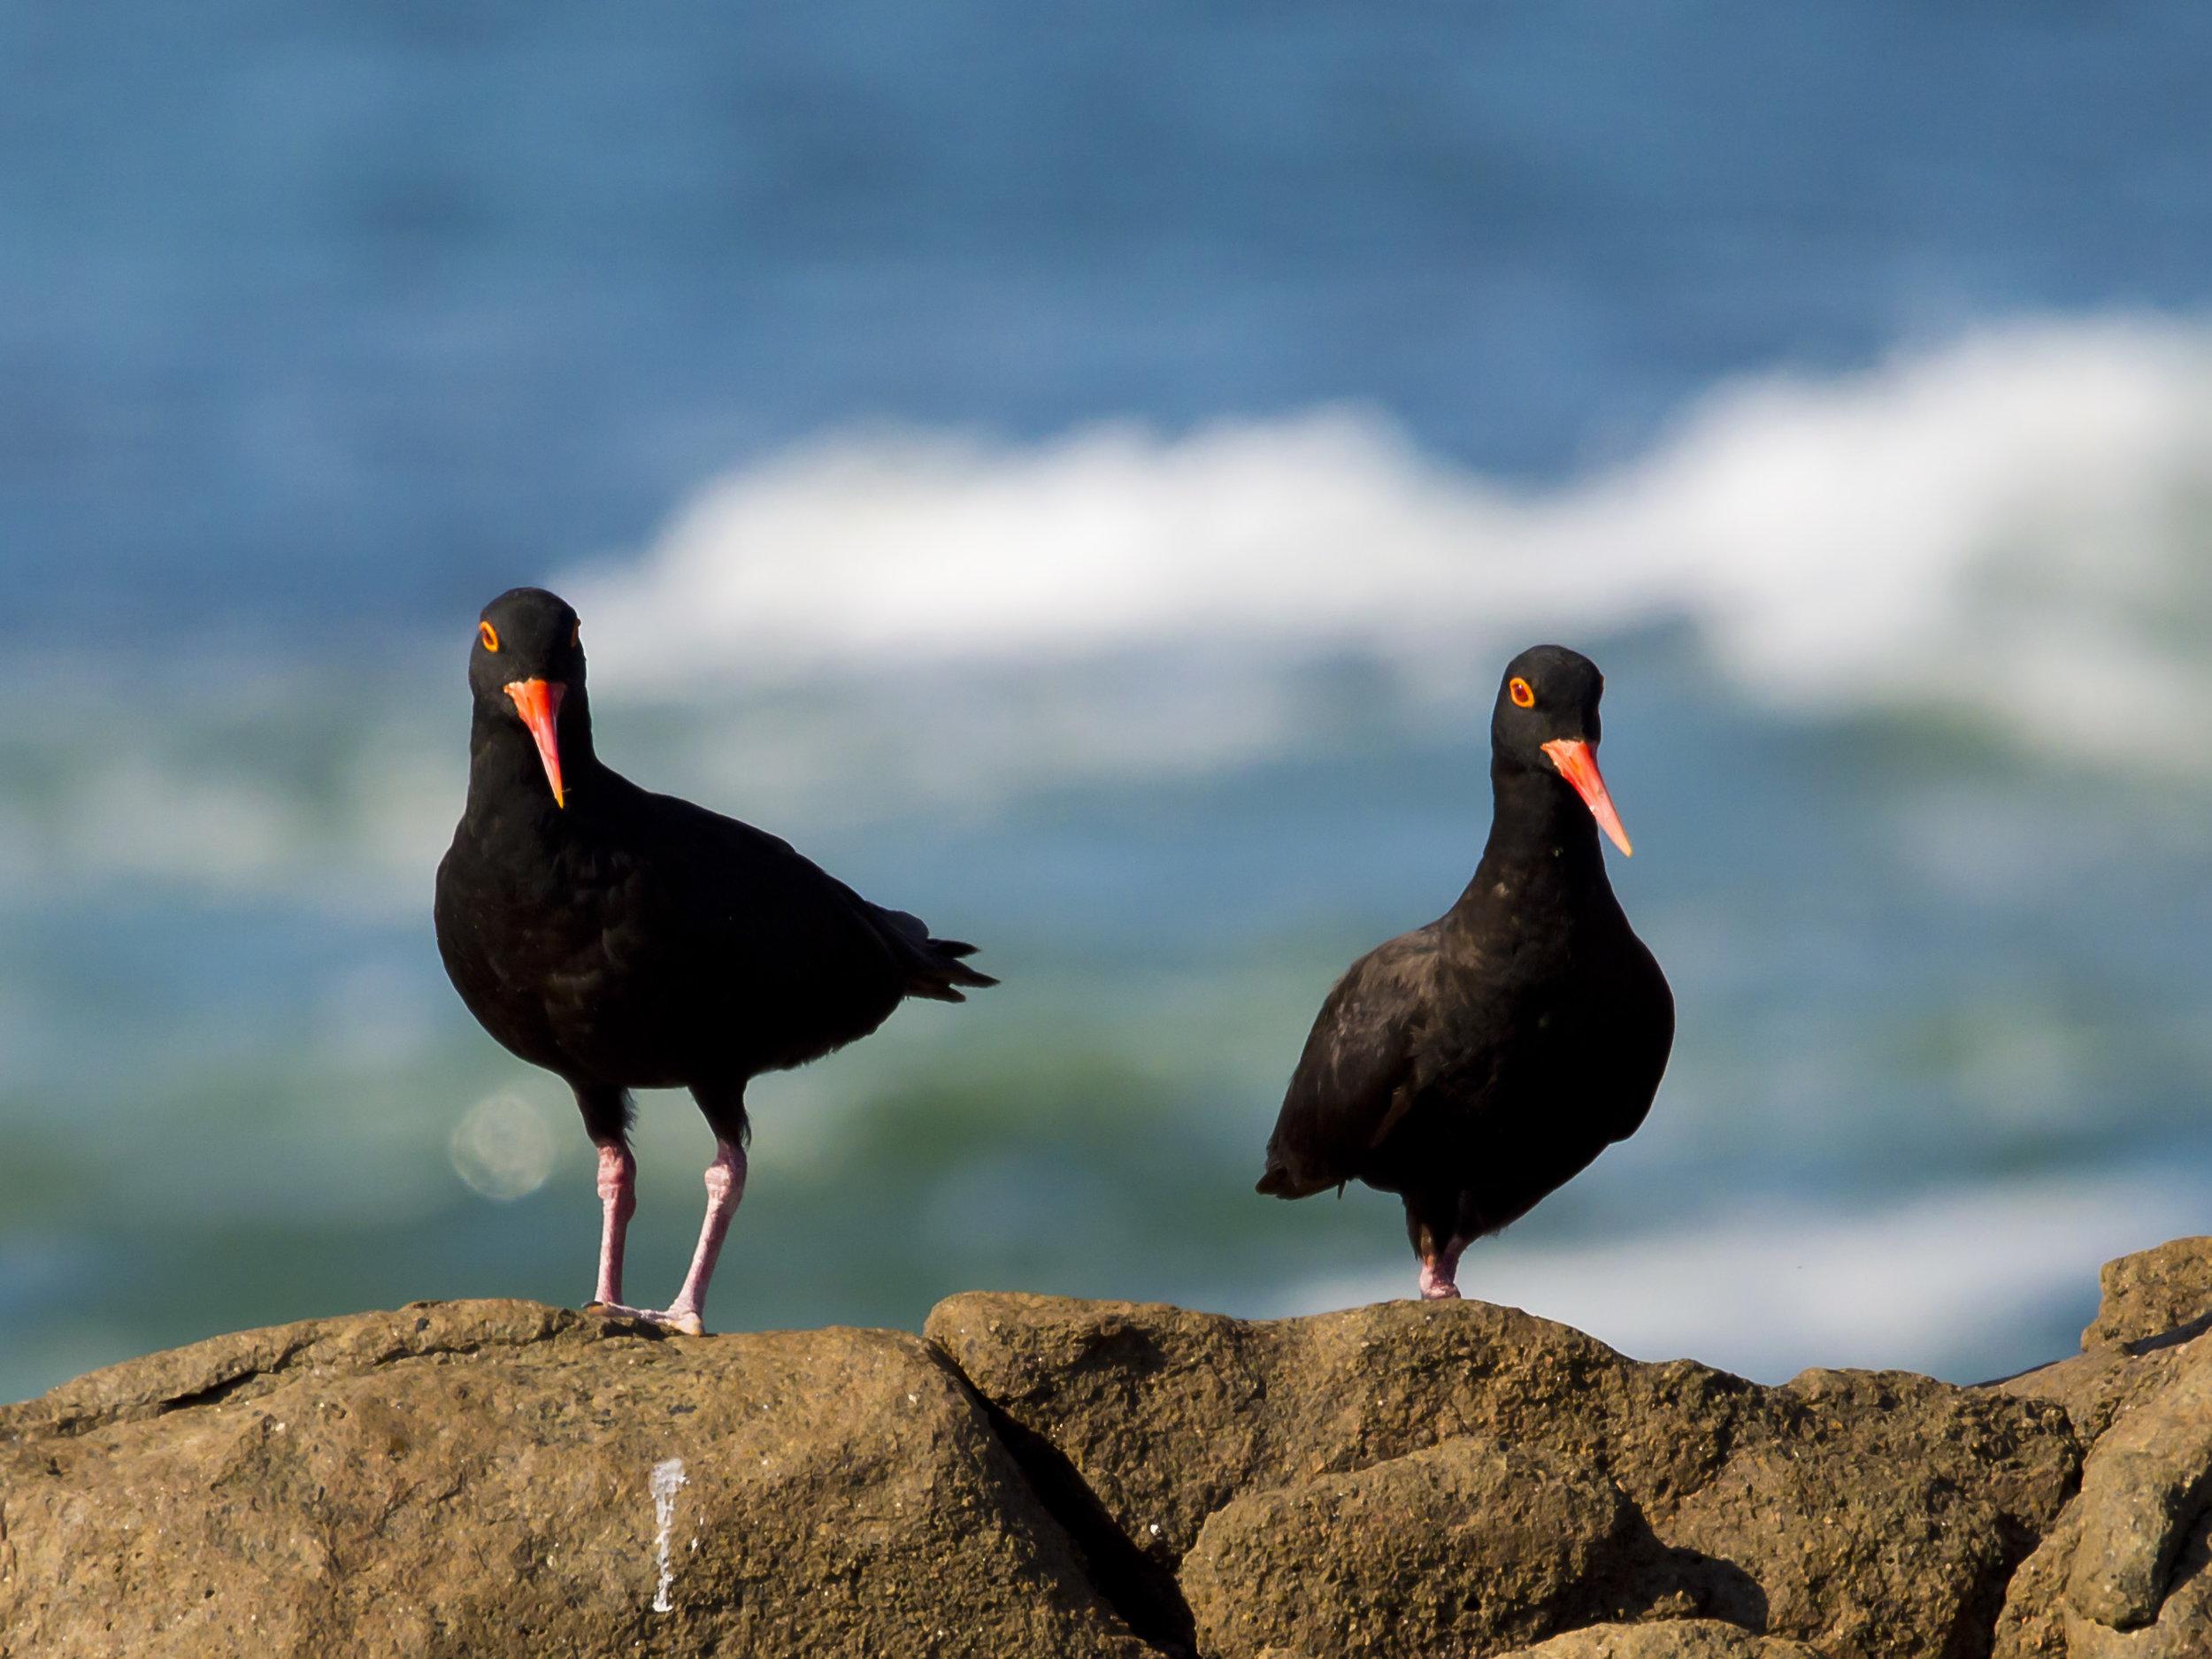 Black Sea Birds on a rock next to the sea at Pringle Bay